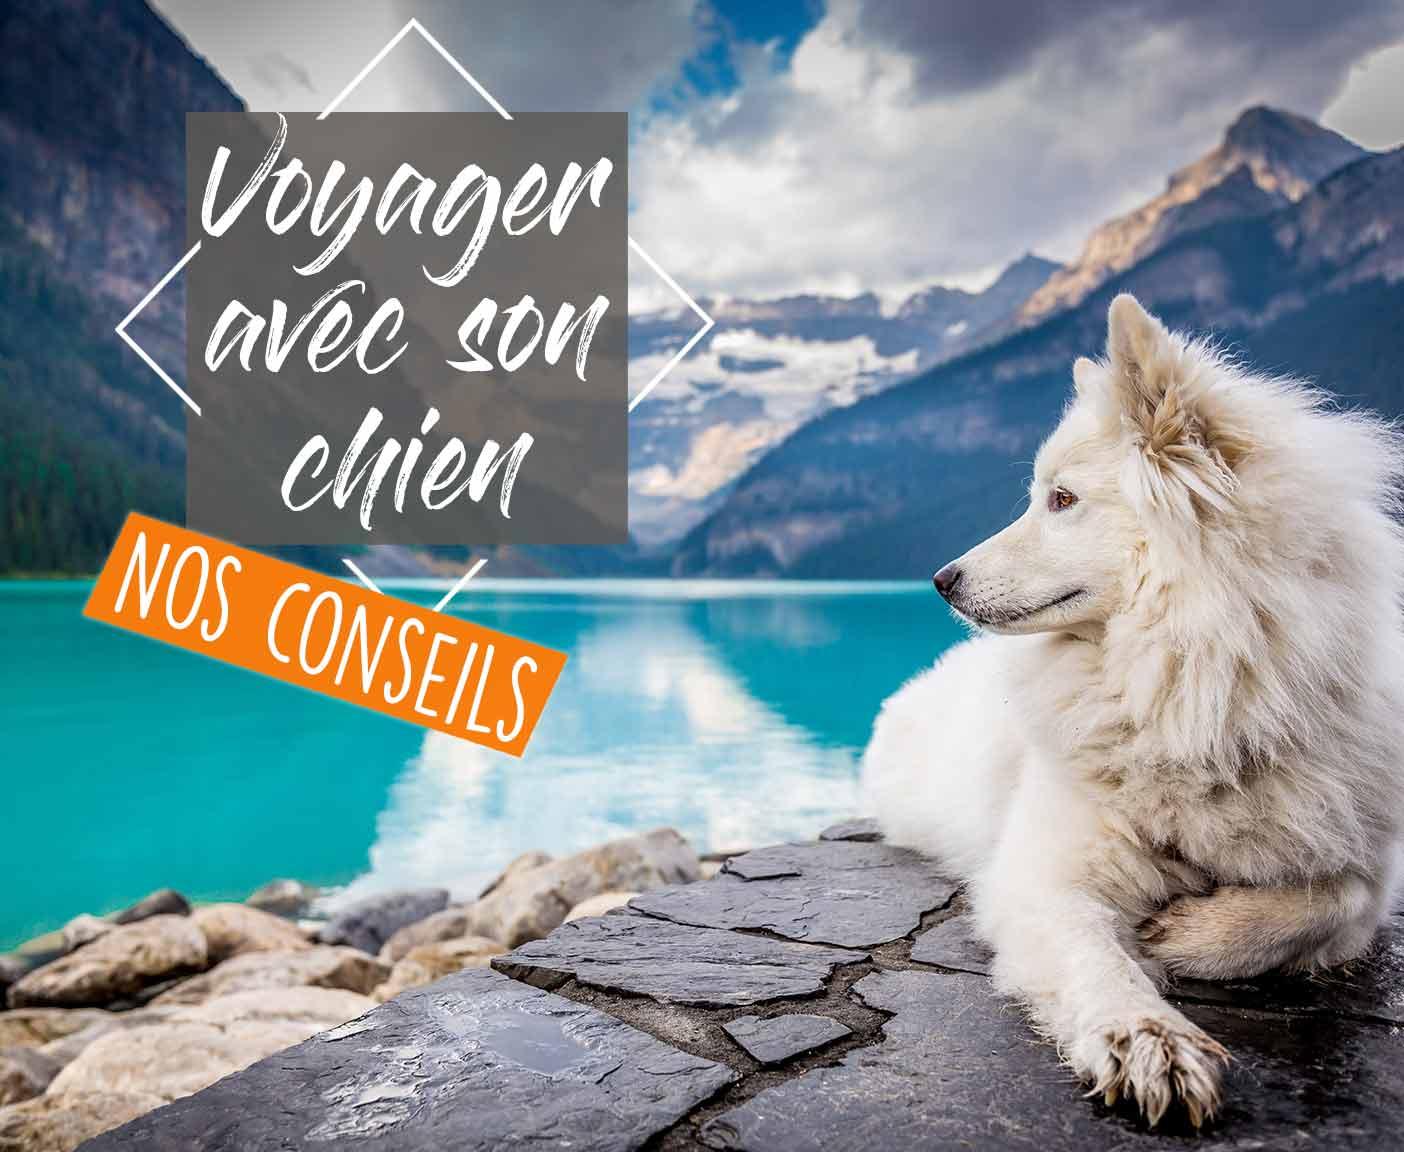 voyager-voyage-chien-van-amenage-fourgon-chiot-liste-passeport-campingcar-roadtrip-vanlife-europe